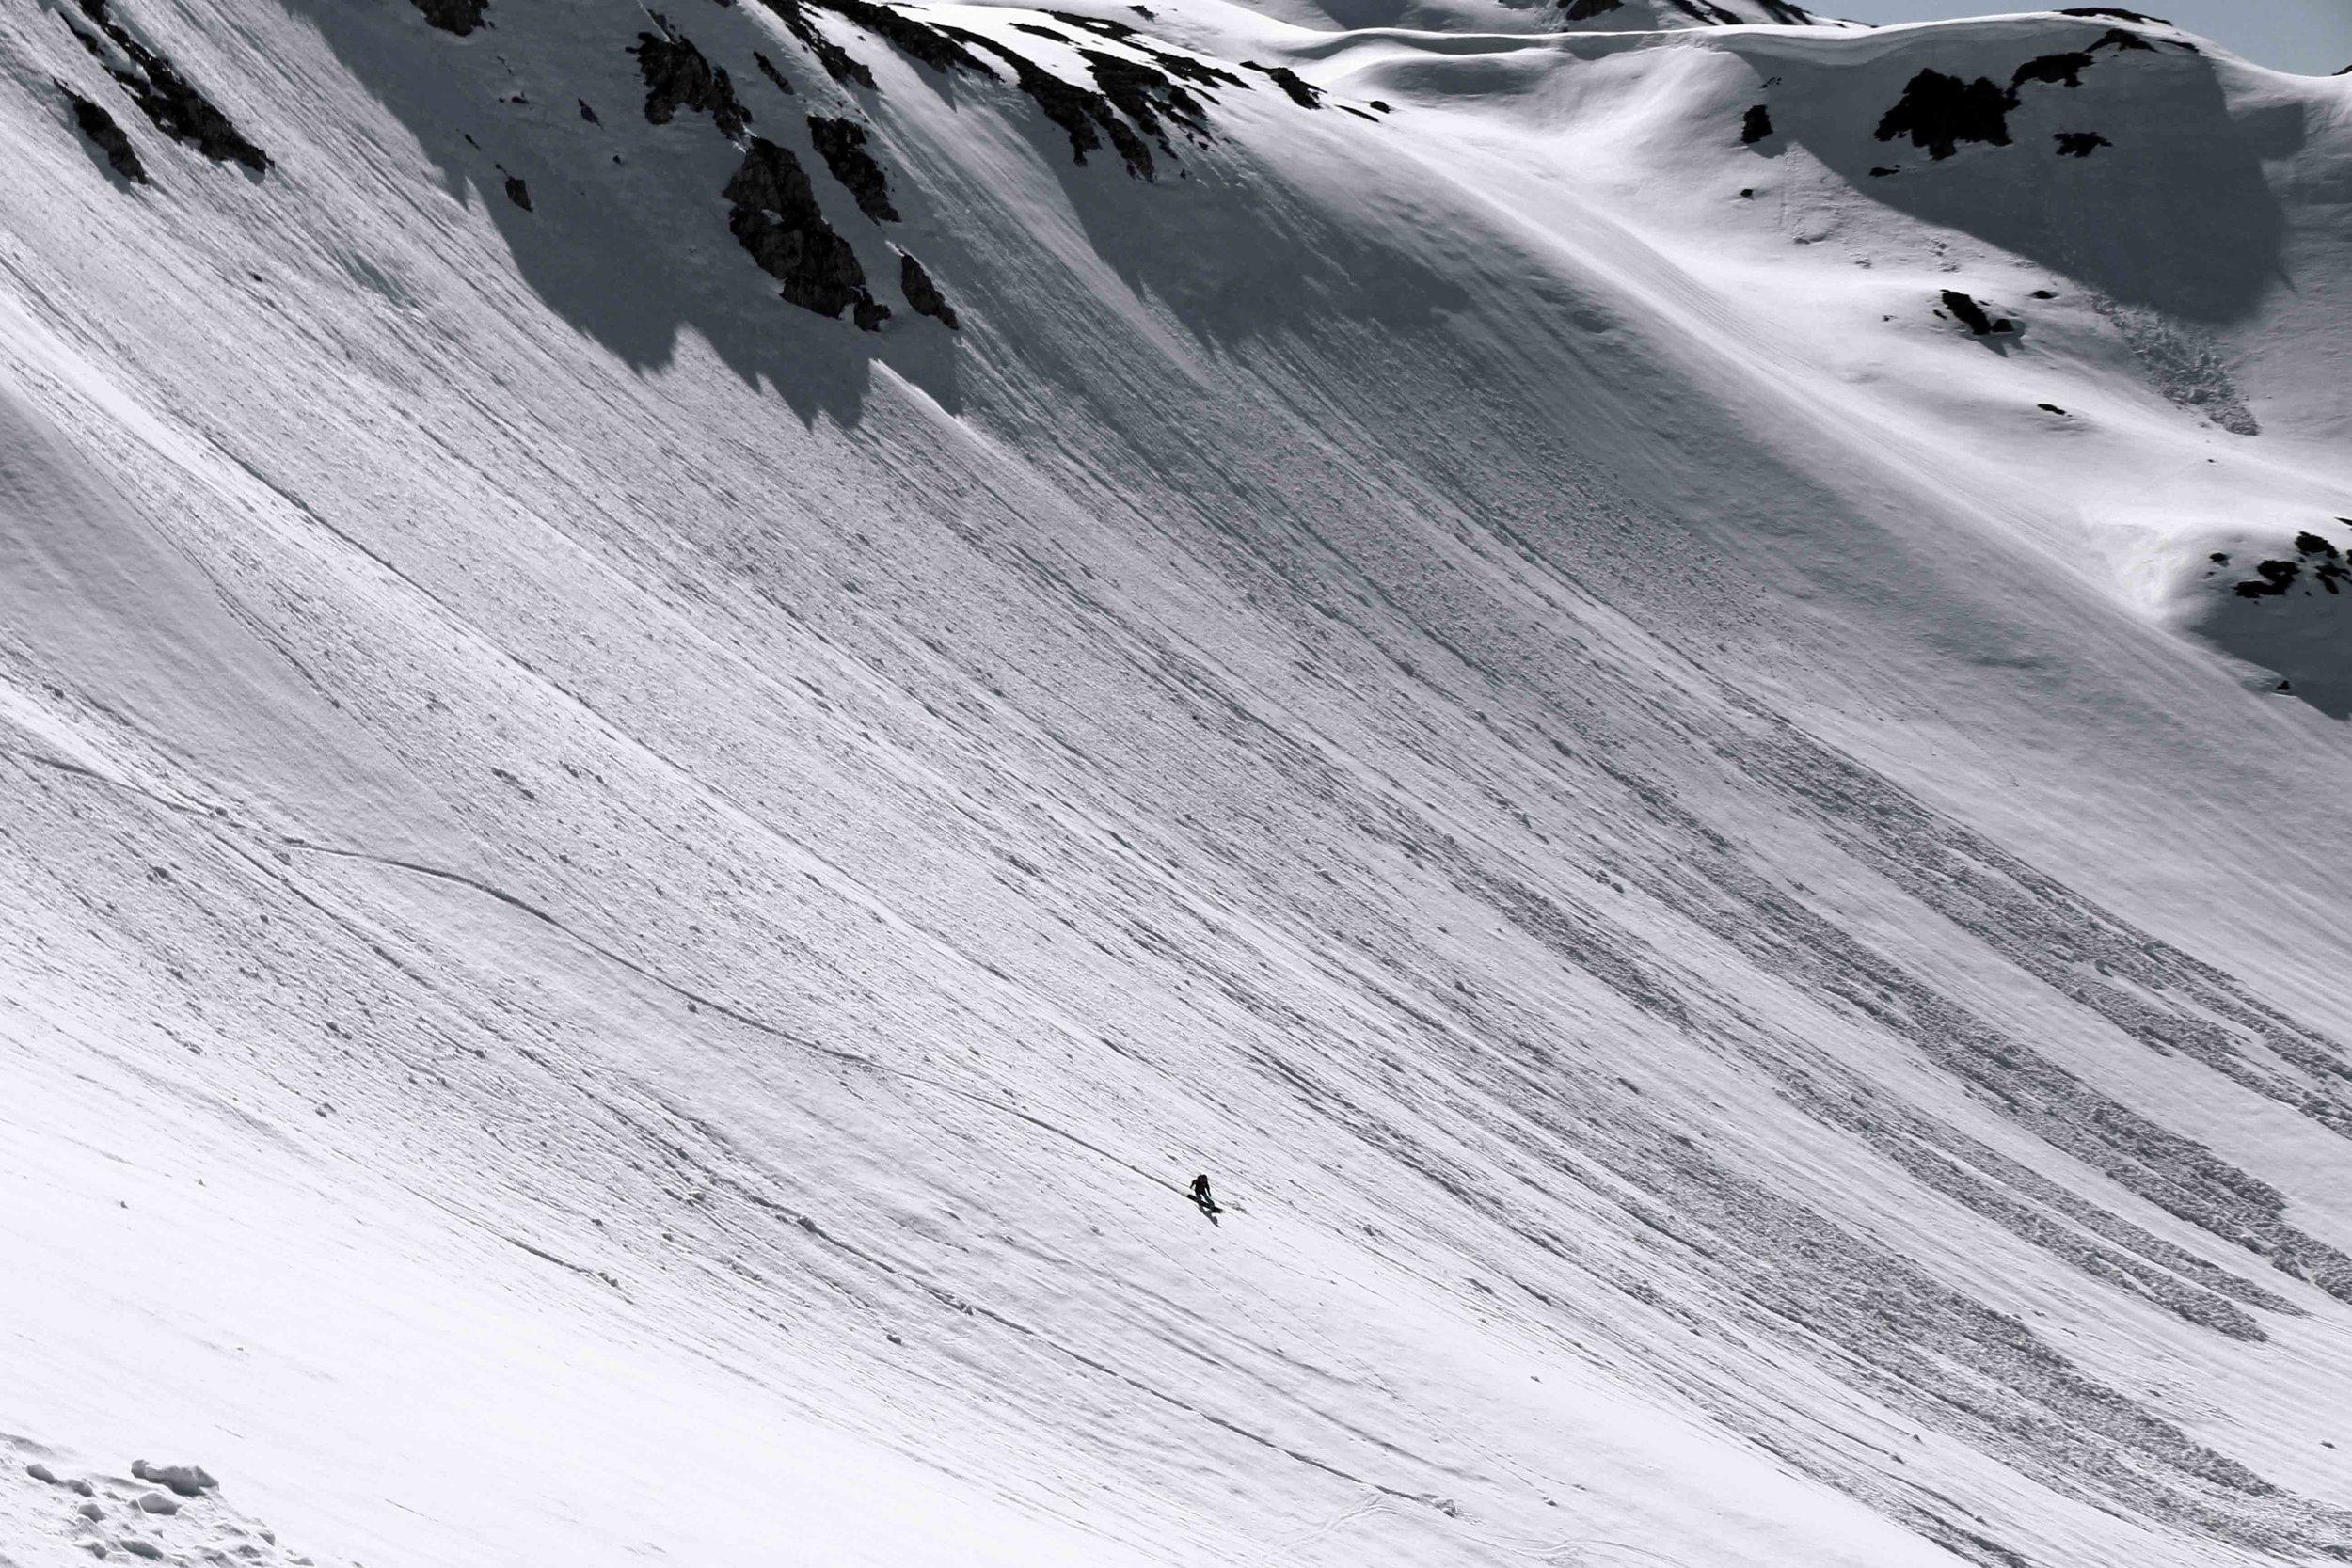 Rider_Manuela Mandl_Foto_SaulFerguson_Location_Obertauern_IceCookieRide.jpg